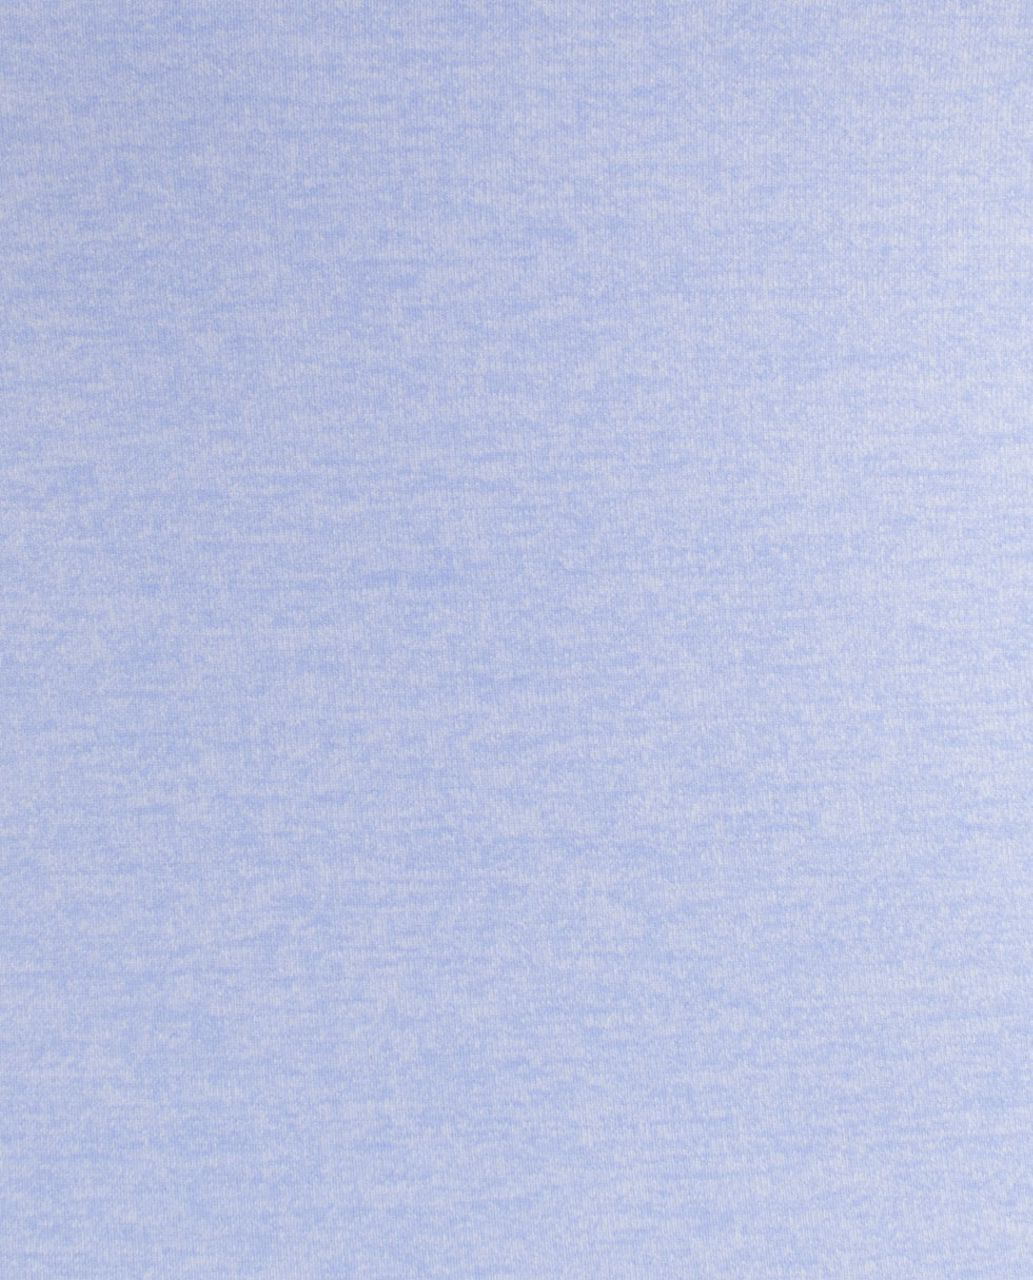 Lululemon Power Y Tank - Heathered Lavender Dusk